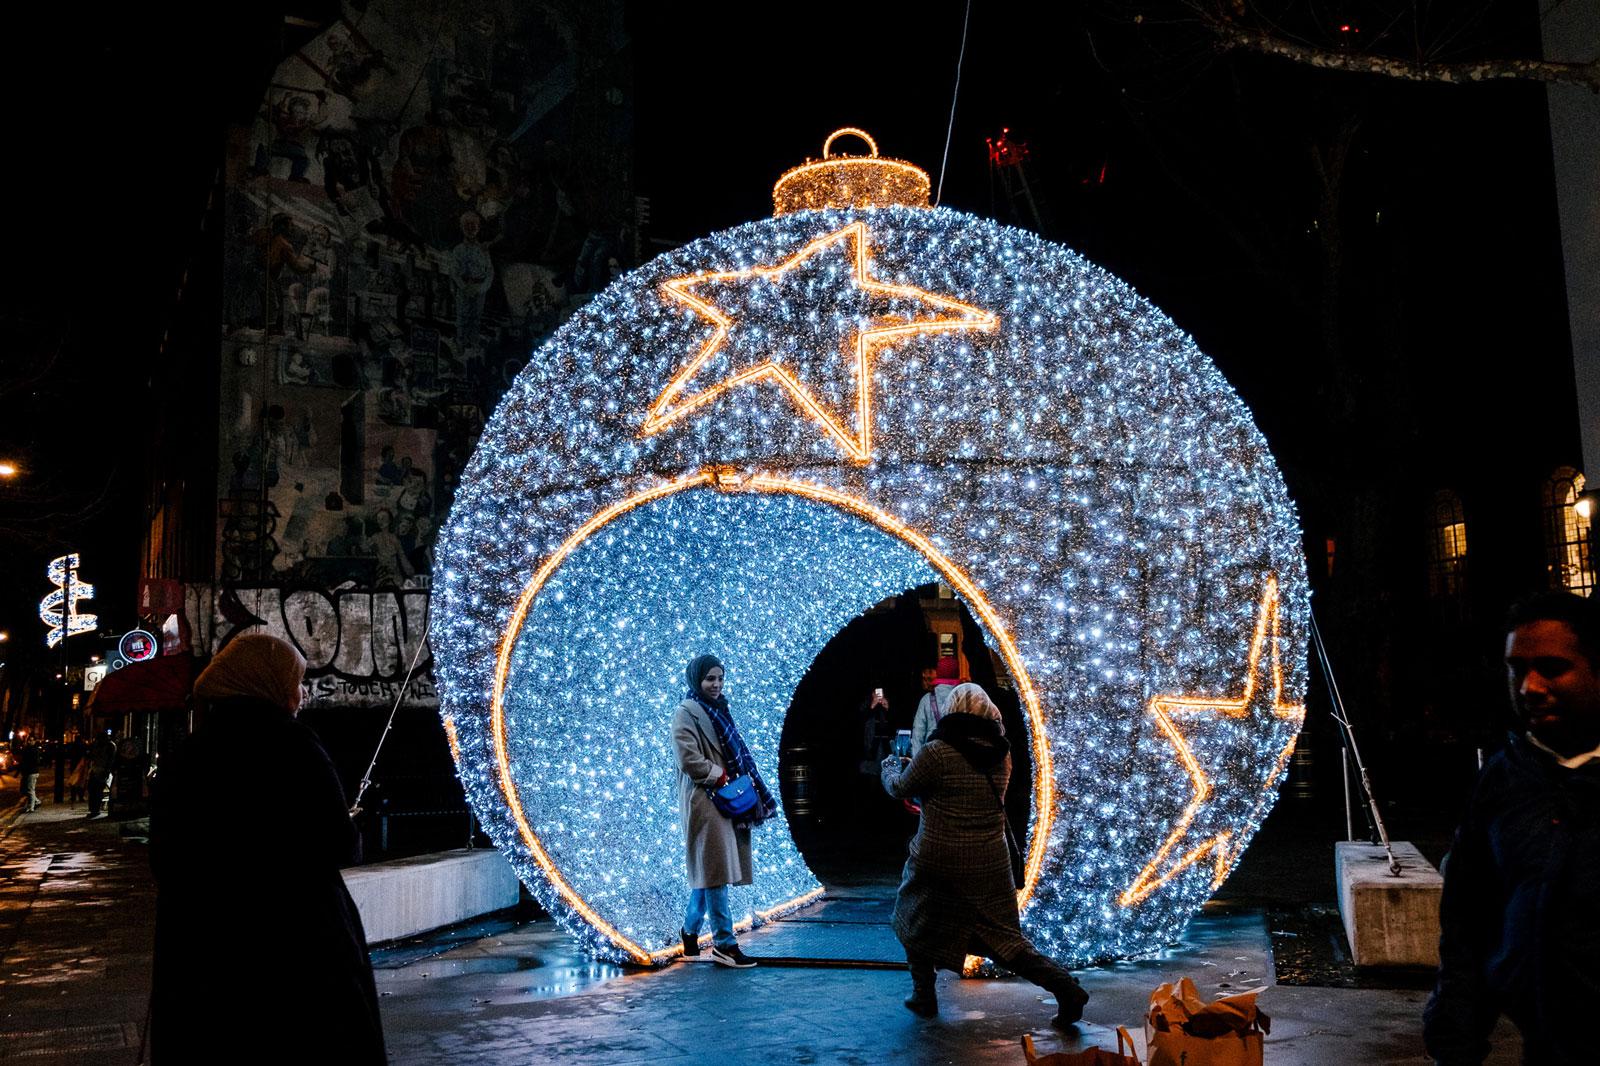 fitzrovia bauble illuminated